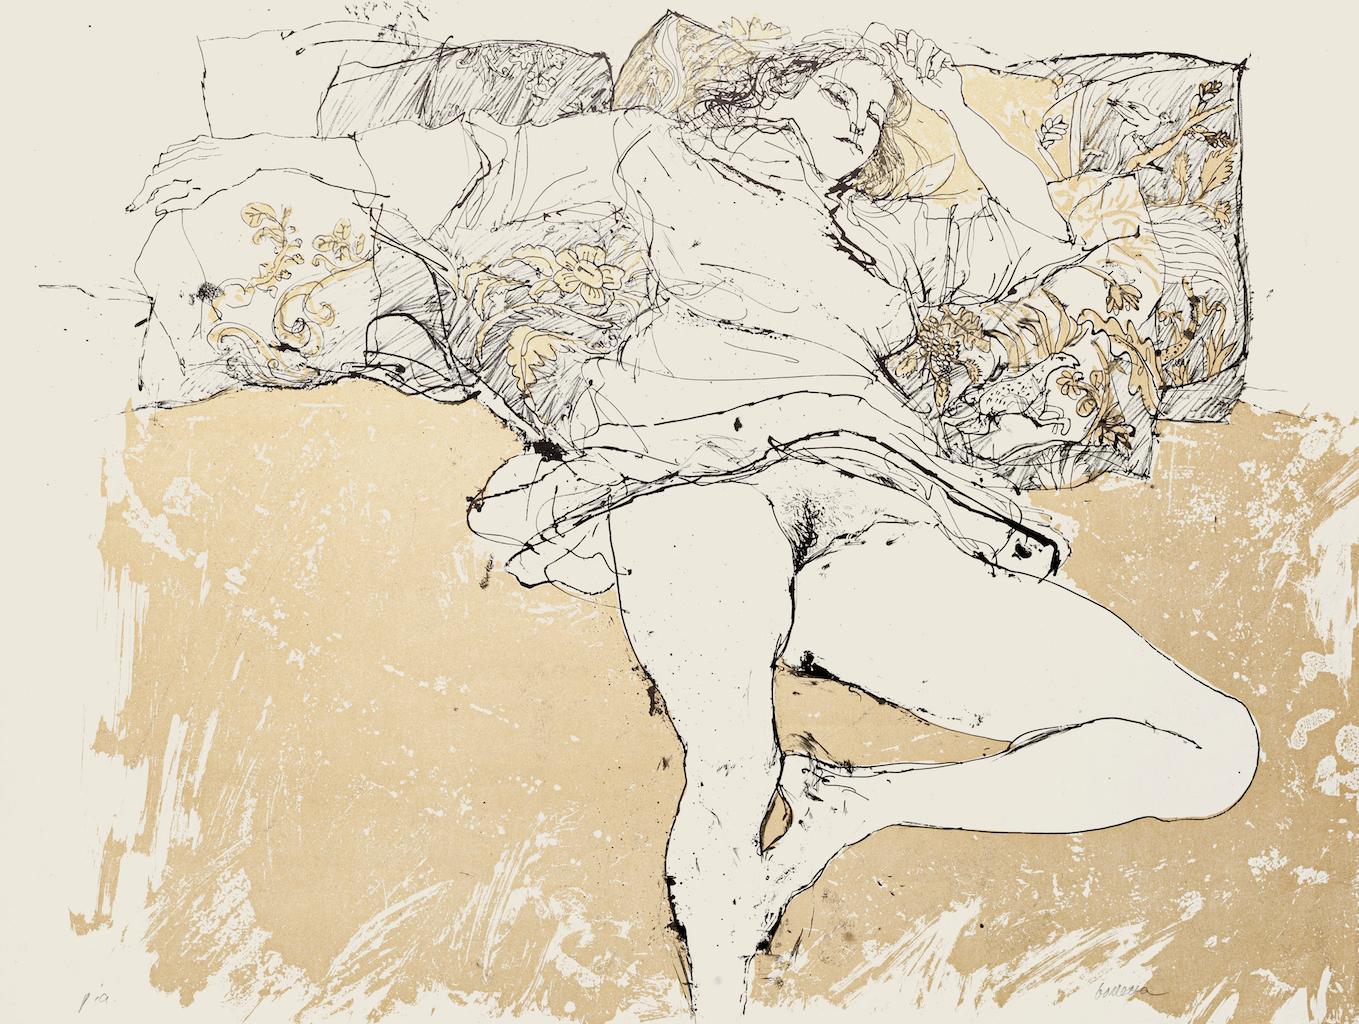 Nude - Original Lithograph on Paper by Sergio Barletta - 1980